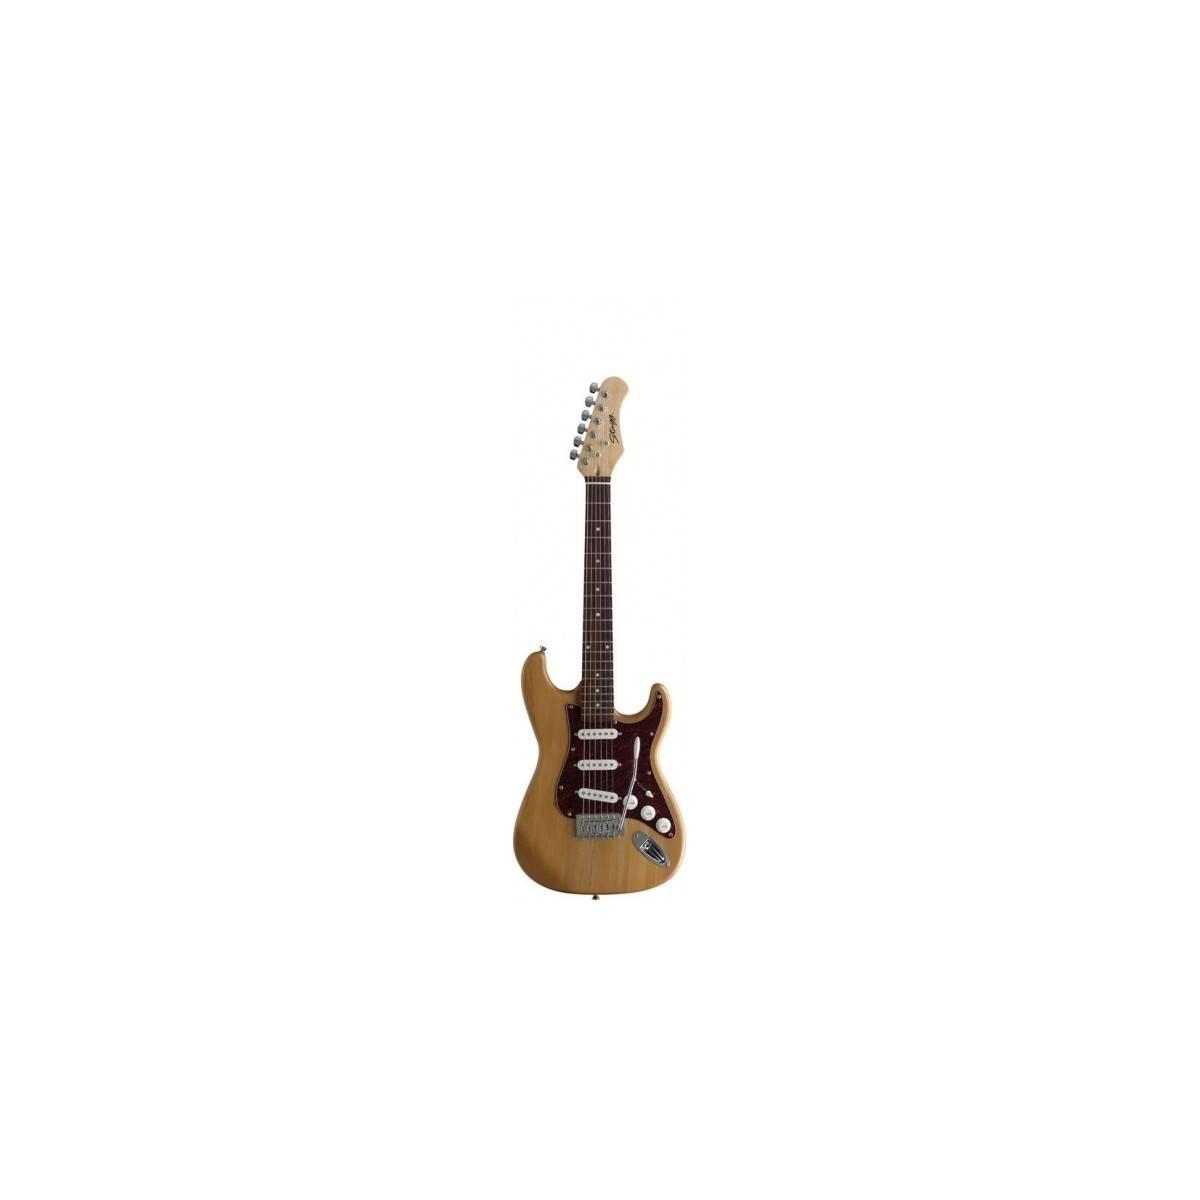 guitare lectrique pour enfant 3 4 stagg facon fender stratocaster. Black Bedroom Furniture Sets. Home Design Ideas